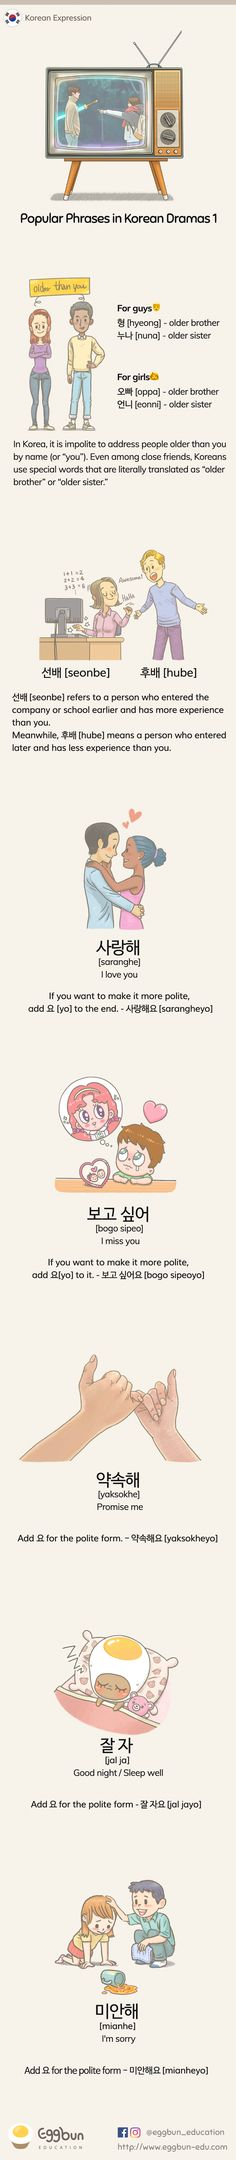 Popular Phrases in Korean Chat to Learn Korean with Eggbun! Korean Phrases, Korean Words, How To Speak Korean, Learn Korean, Learn Hangul, Korean Lessons, Korean Language Learning, Aesthetic Words, Language Study